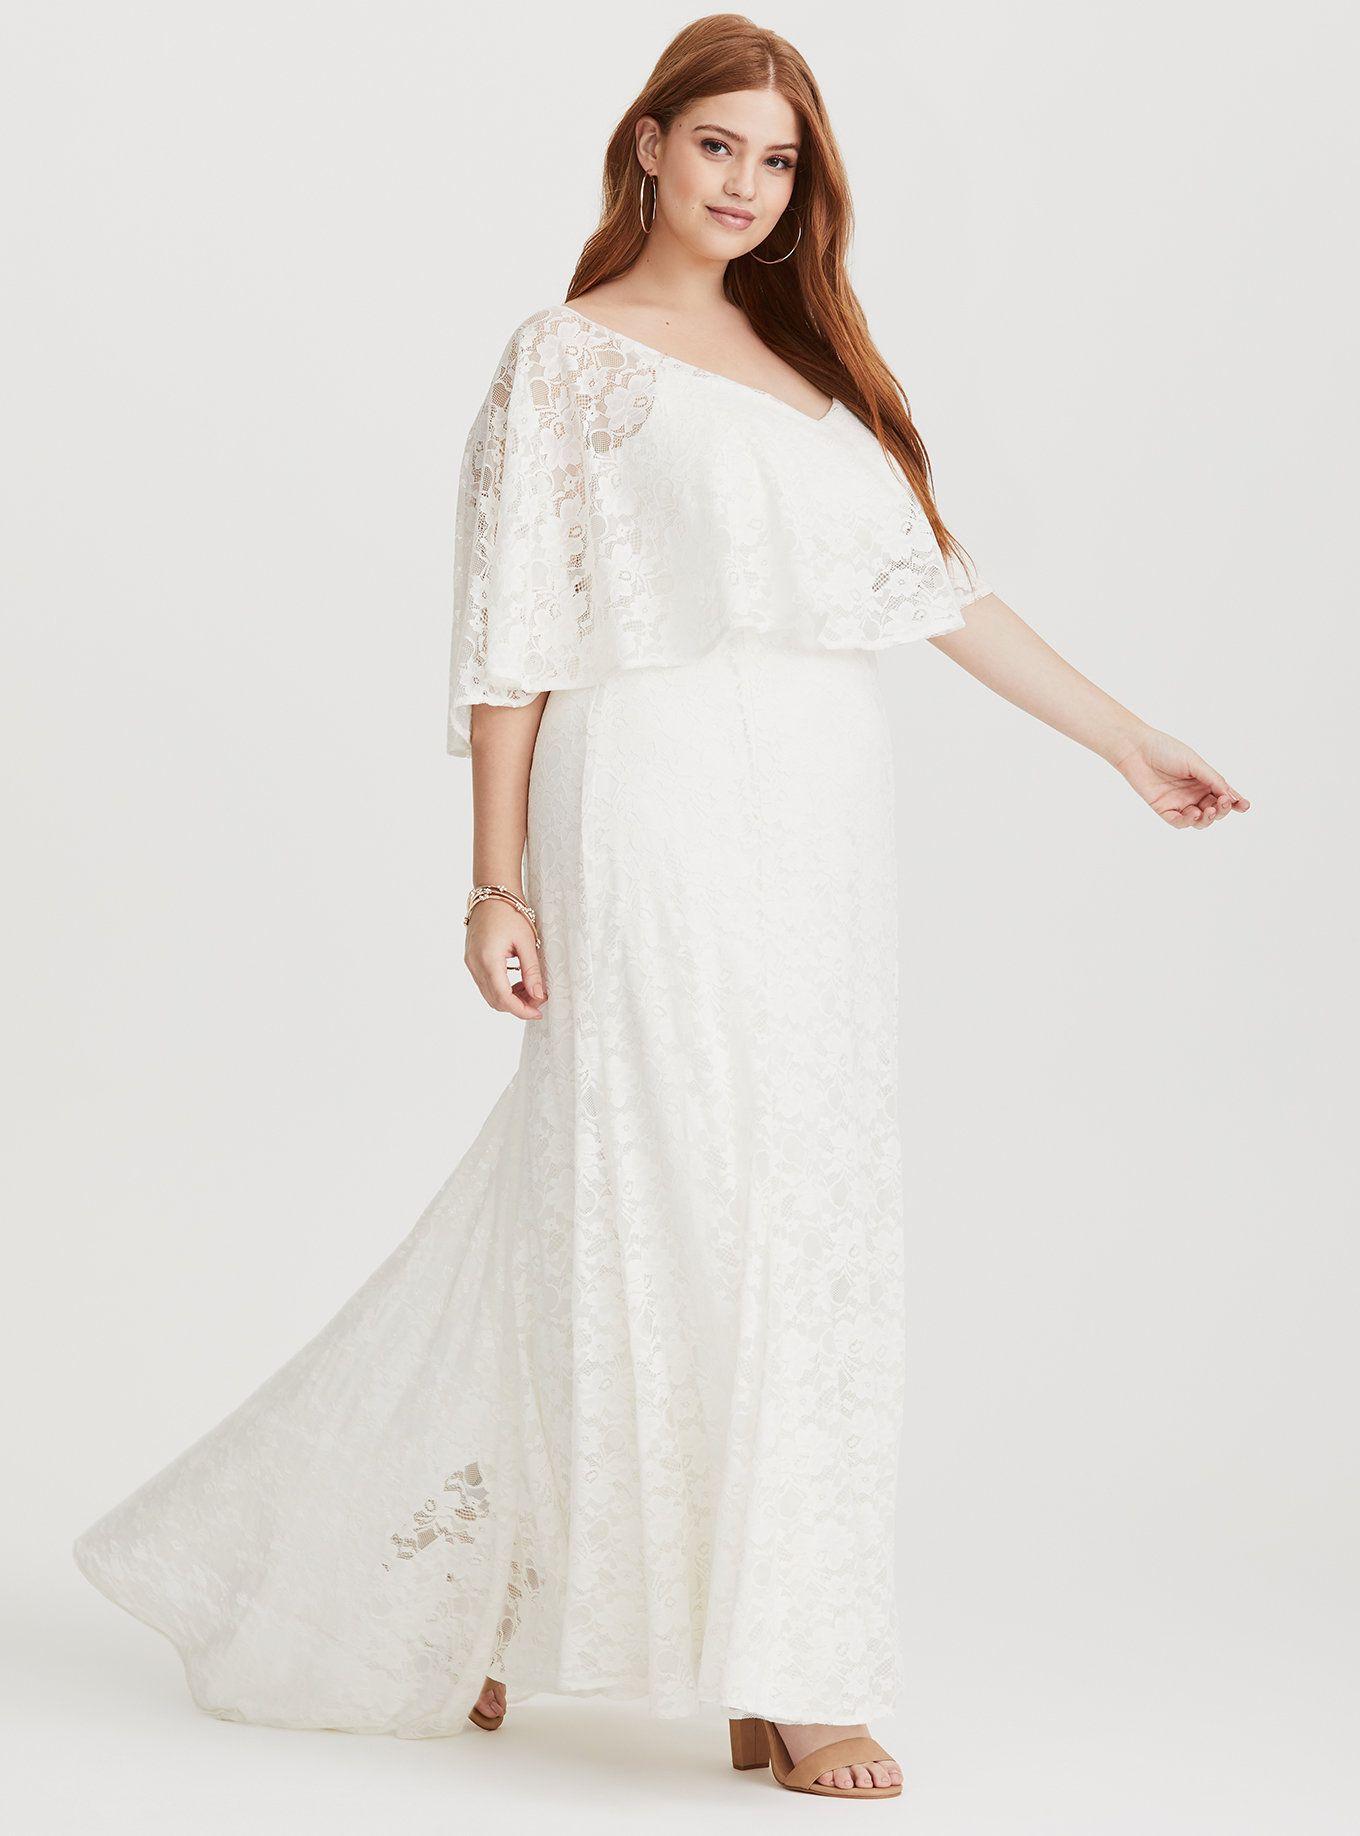 Ivory Lace Capelet Wedding Dress Floral Chiffon Maxi Dress Stretch Lace Dress Ivory Lace Maxi Dress [ 1836 x 1360 Pixel ]